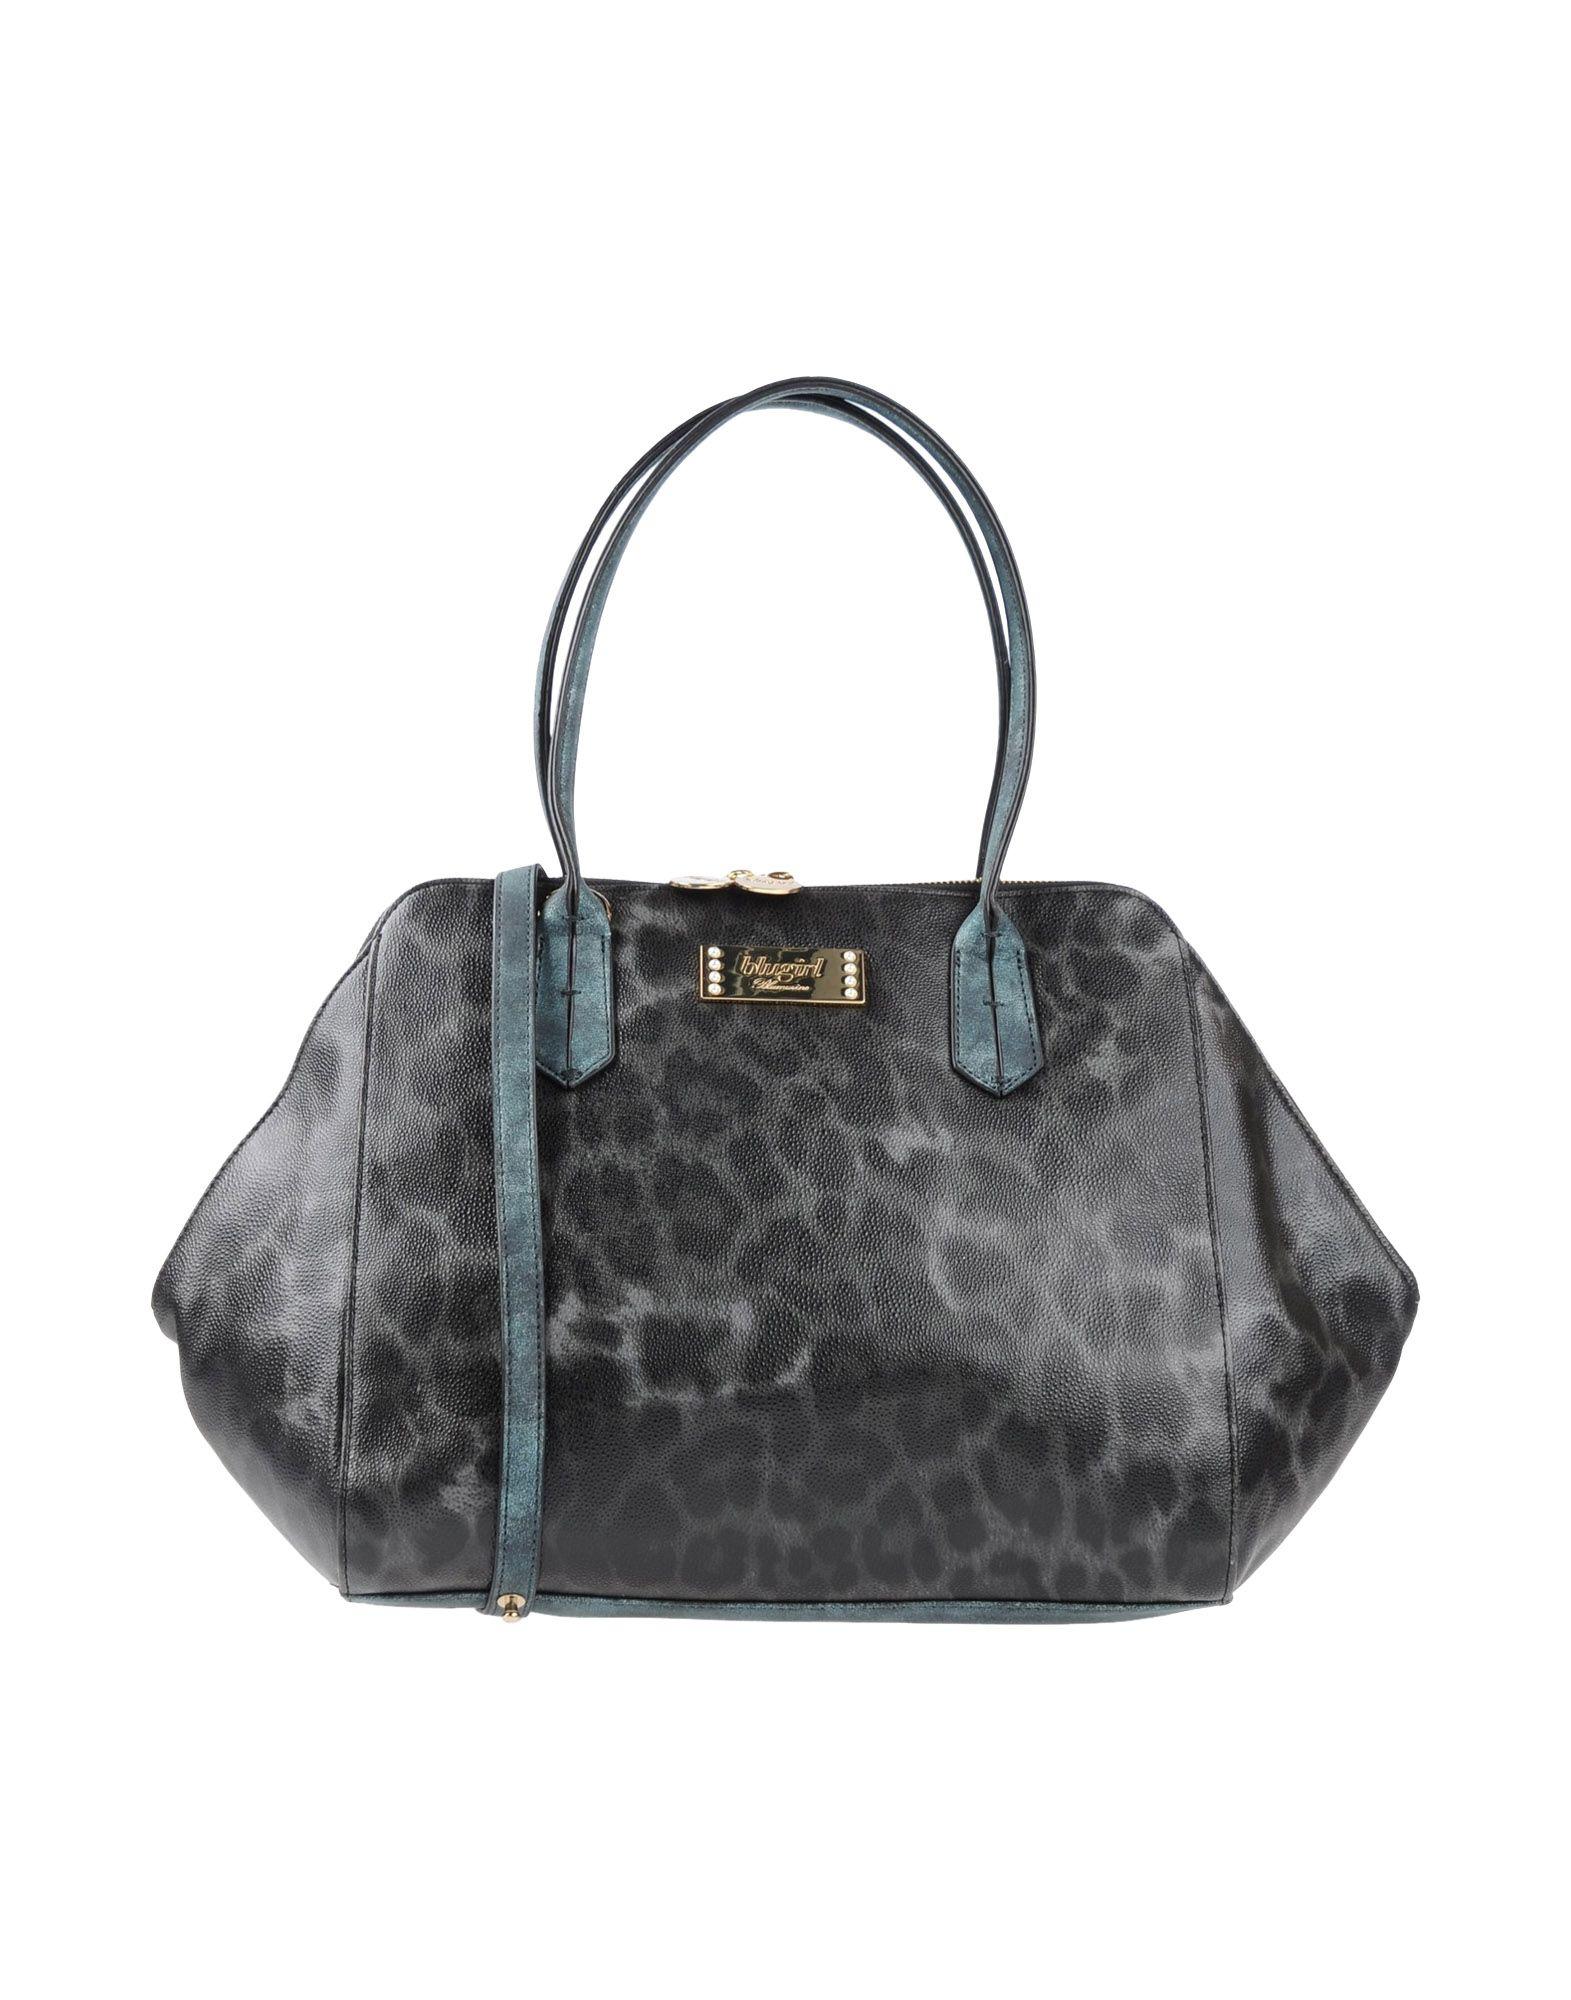 Blugirl blumarine Handbag in Gray (Lead)